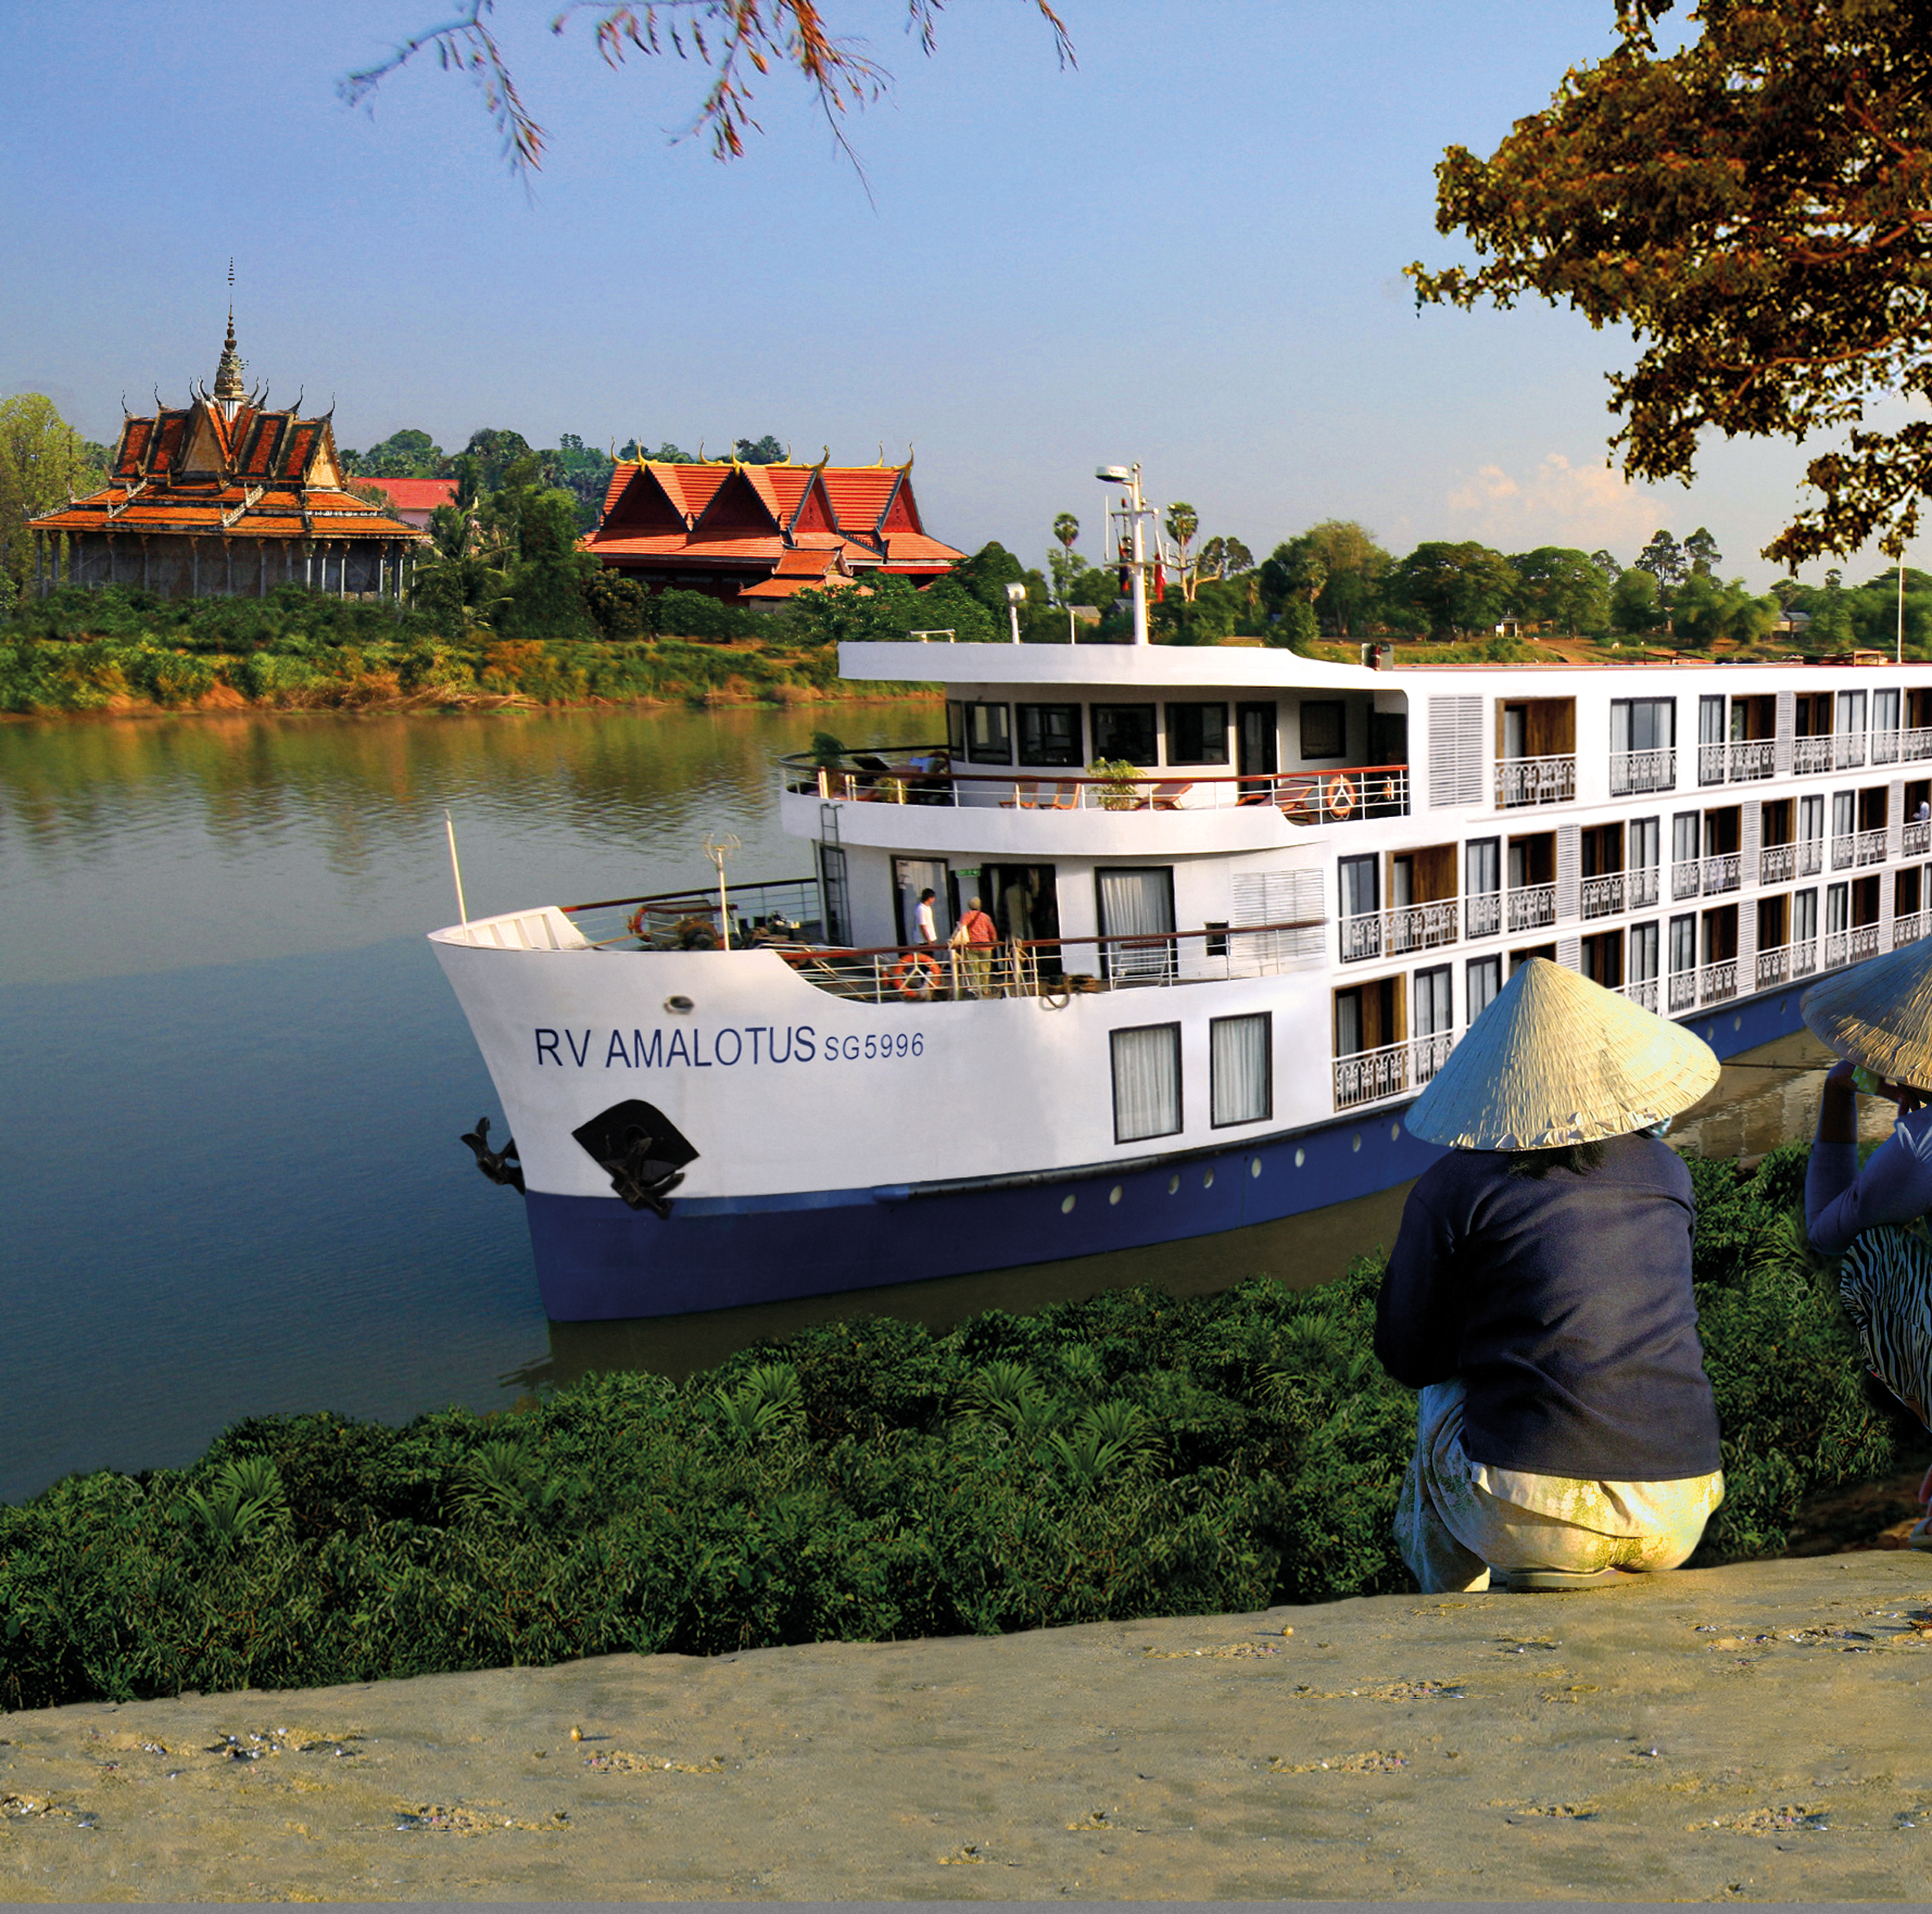 5 Star Luxury River Cruises Through Eurooe: APT River Cruising